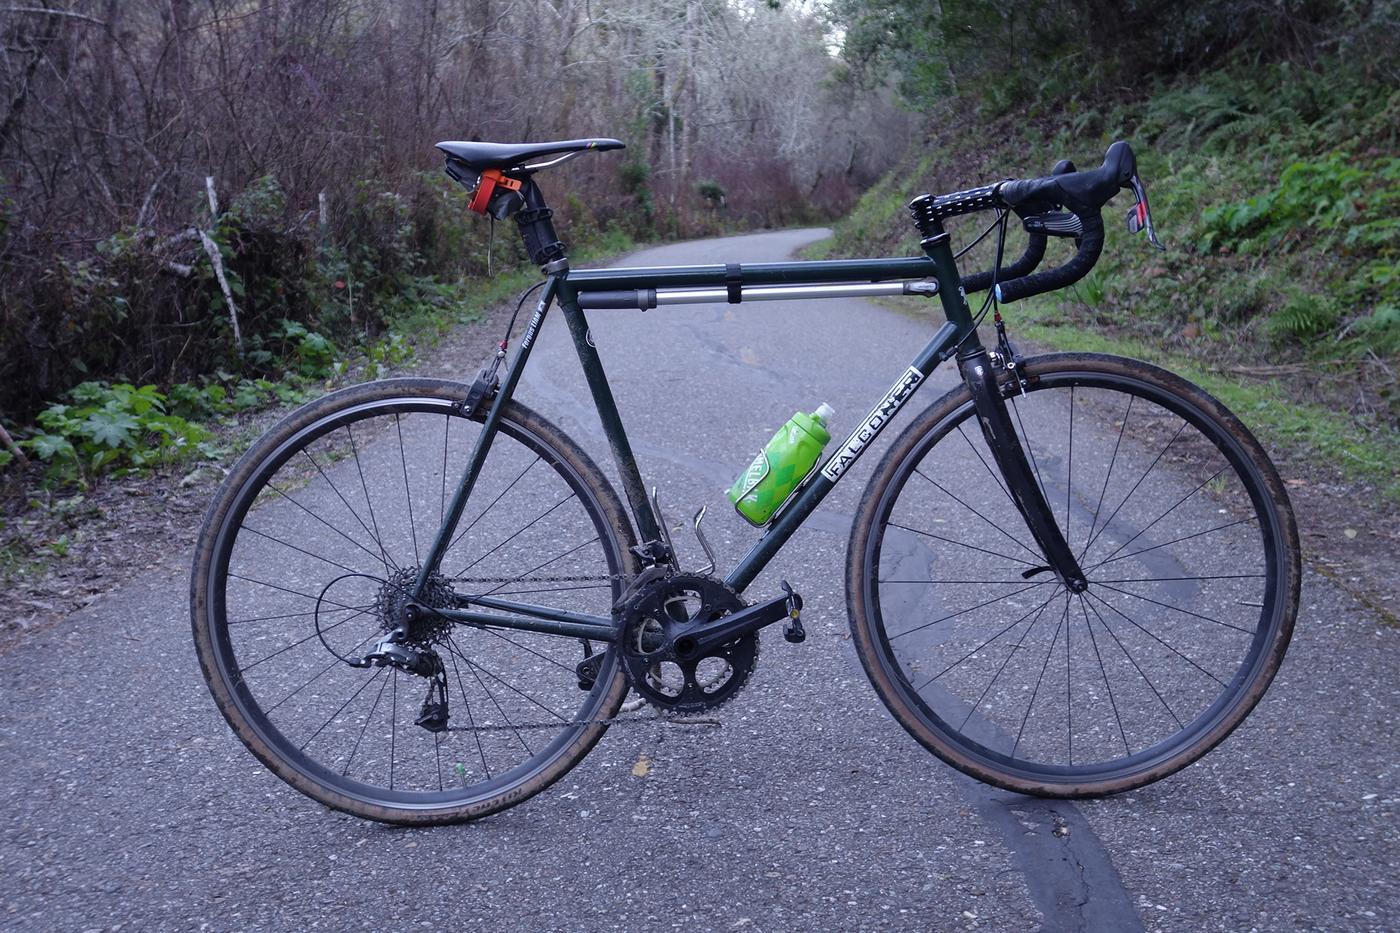 Readers' Rides: Fergus' Falconer Road